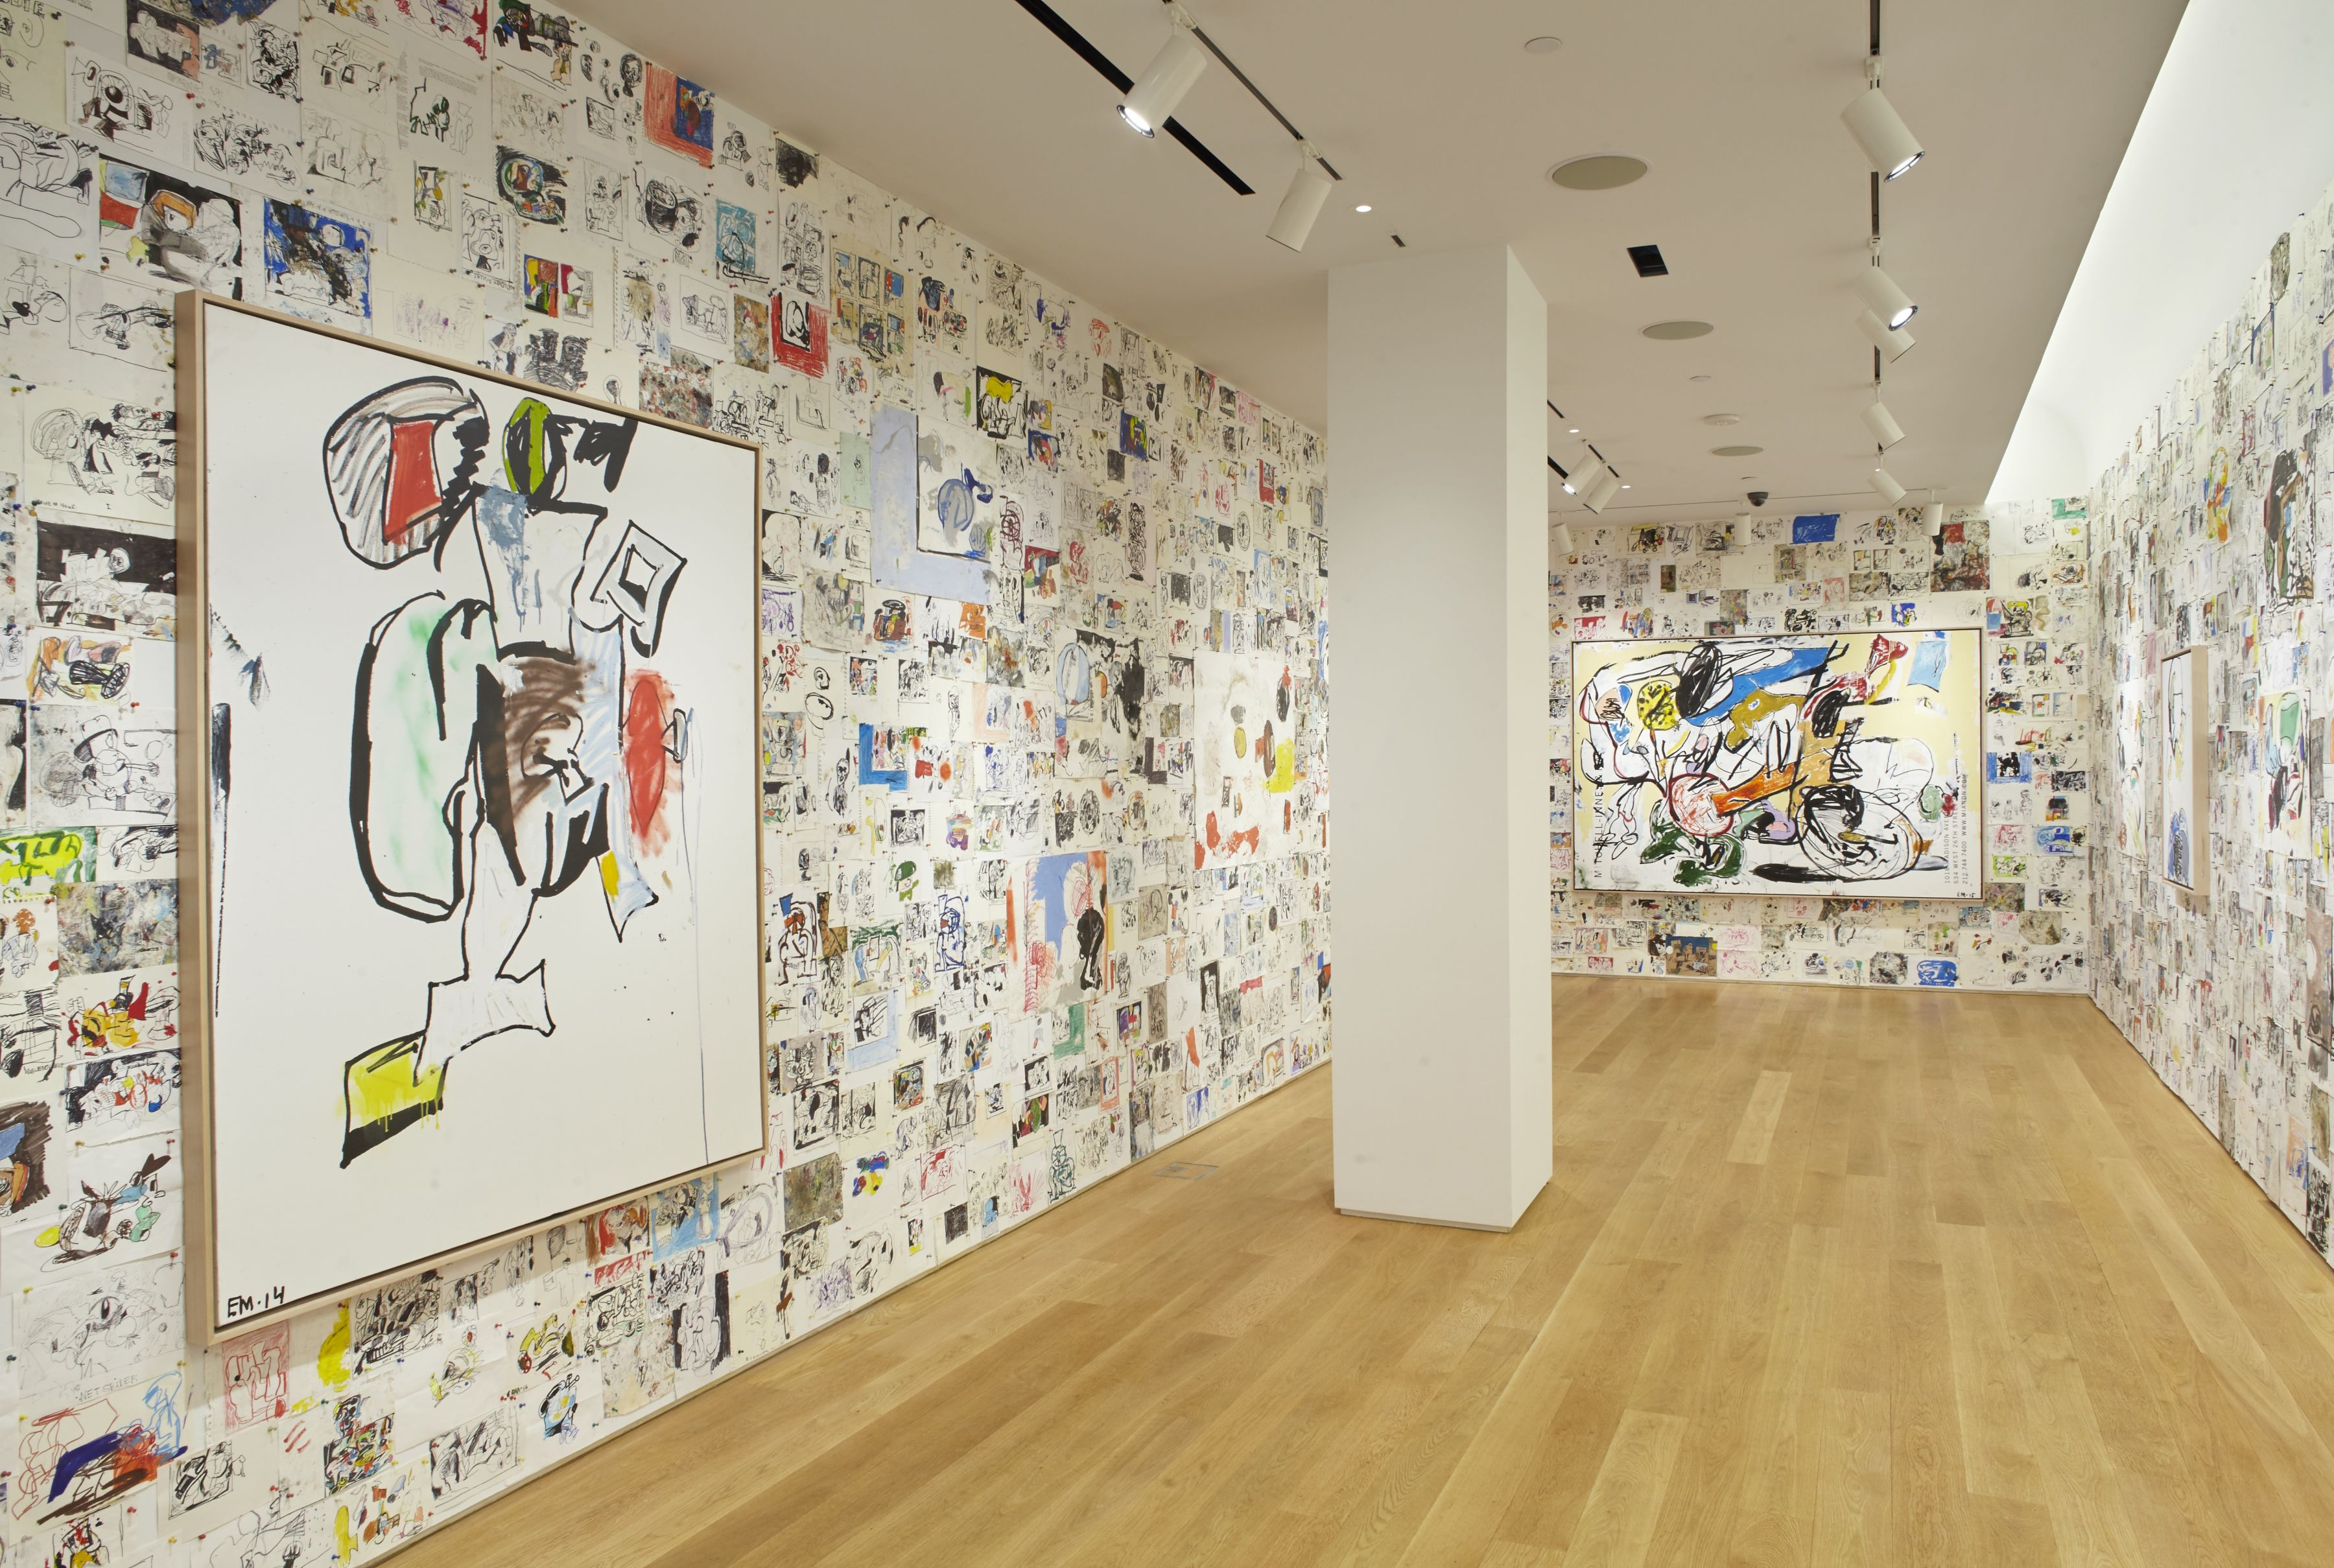 EDDIE MARTINEZInstallation view ofStudio Wallat The Drawing Center, New York, NY, 2017